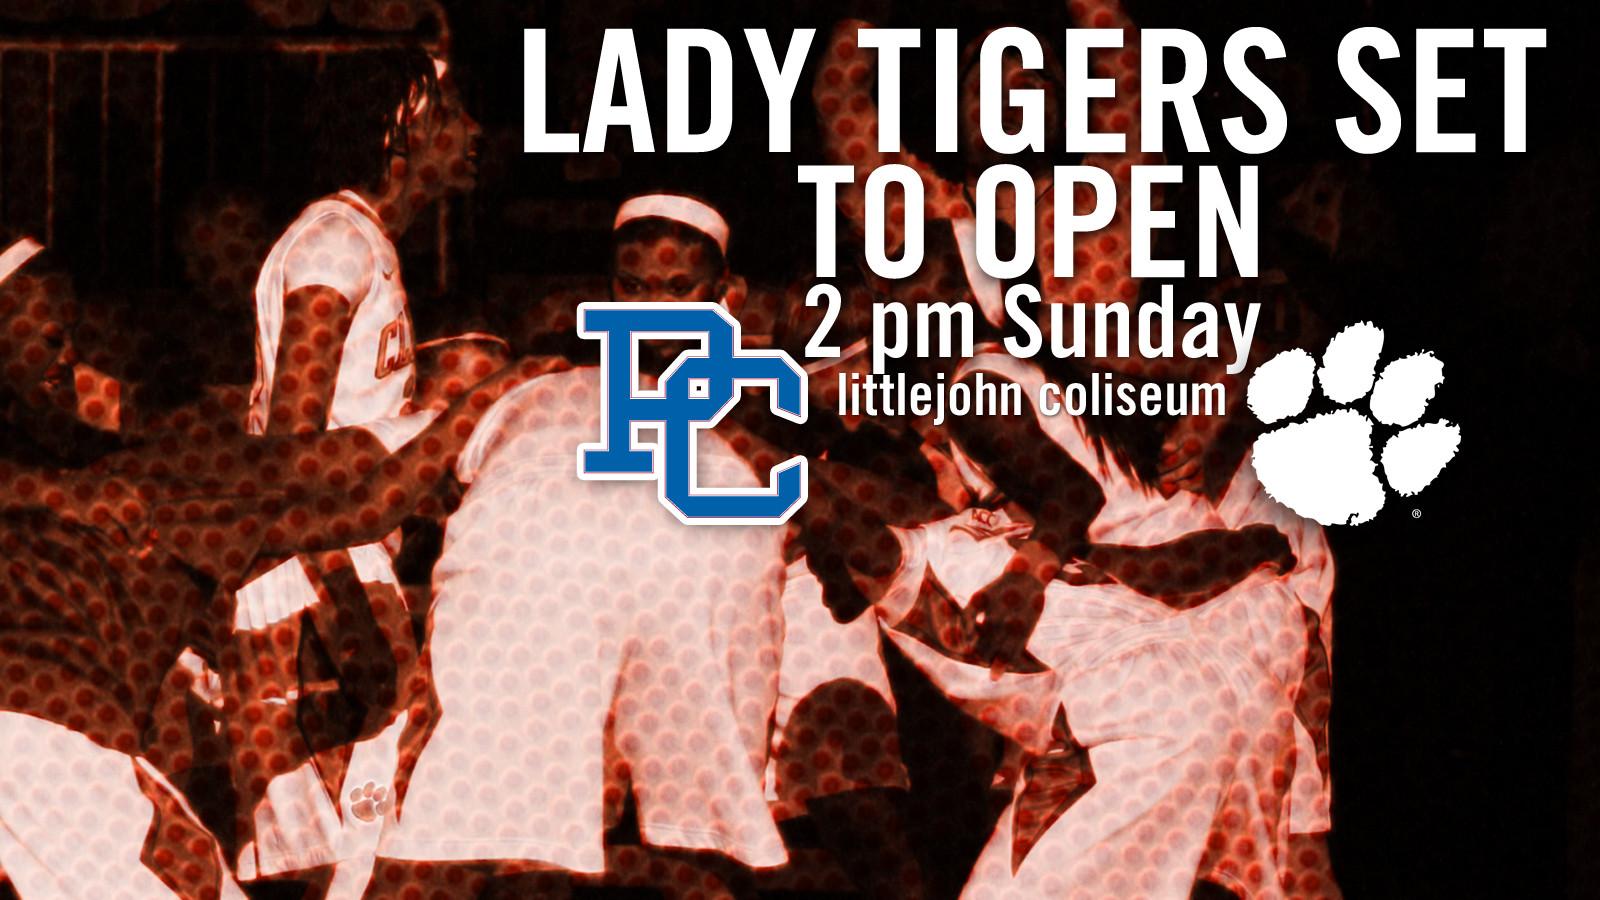 Lady Tigers Open Season Sunday